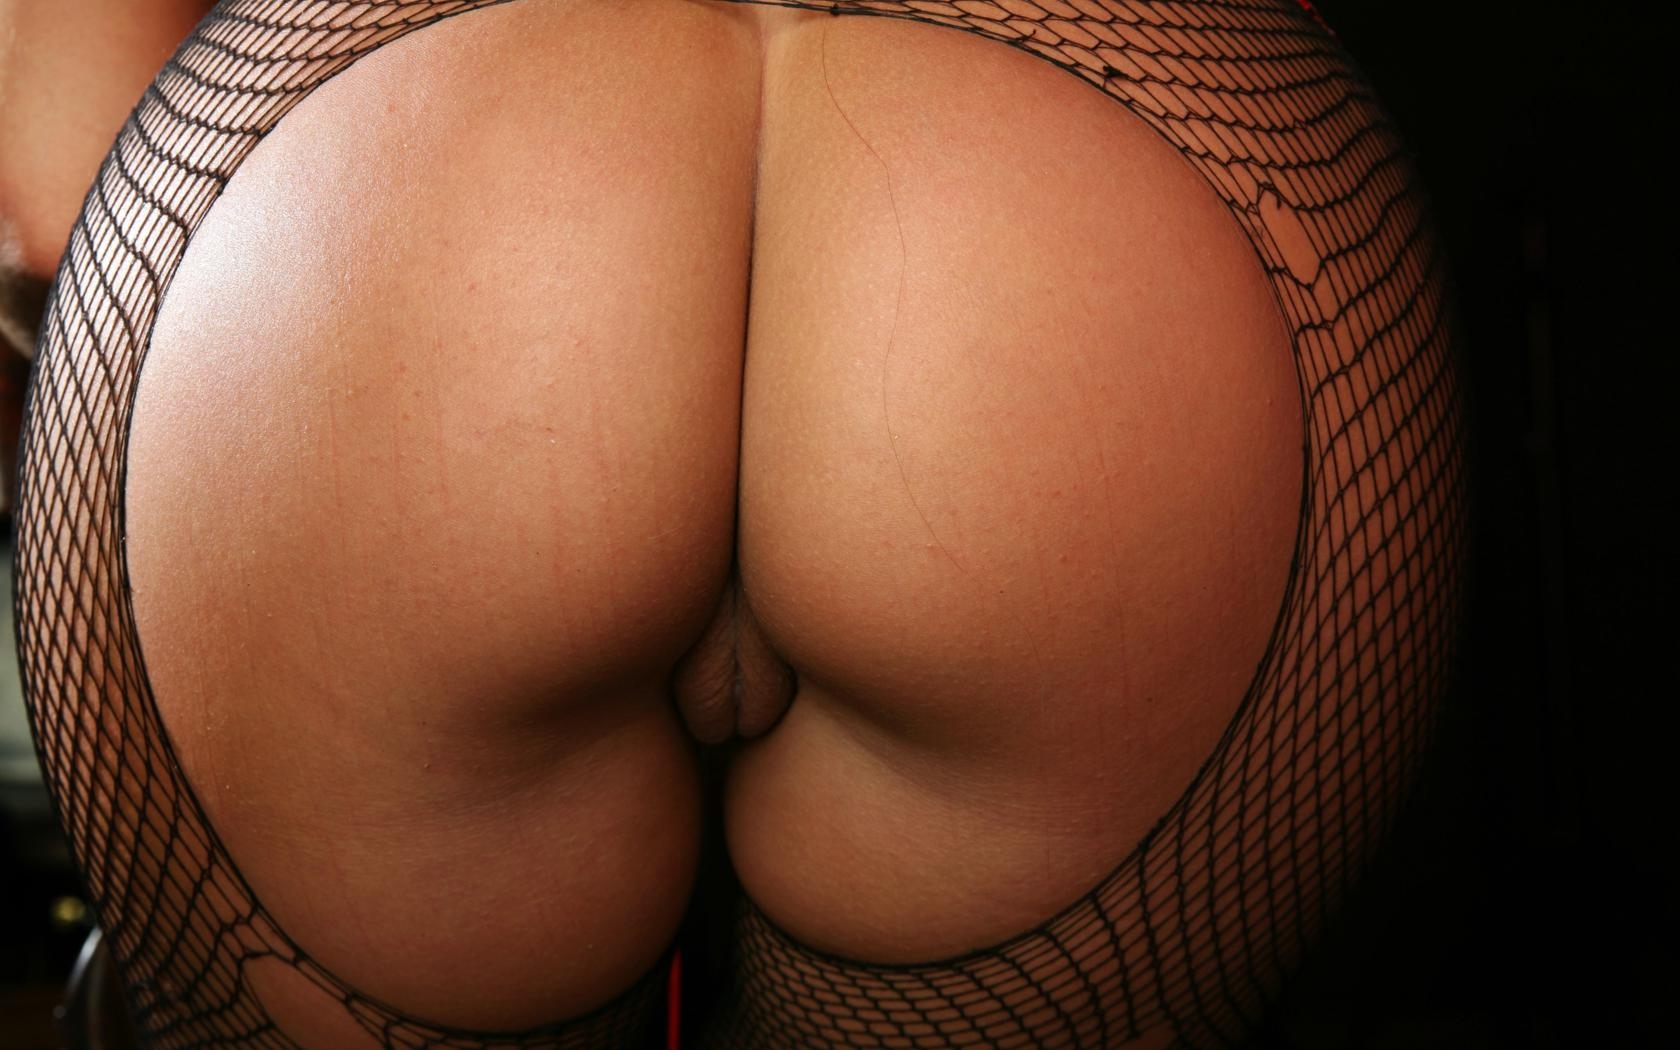 Amazing Big Pussy download photo 1680x1050, sylvia, model, amazing, big ass